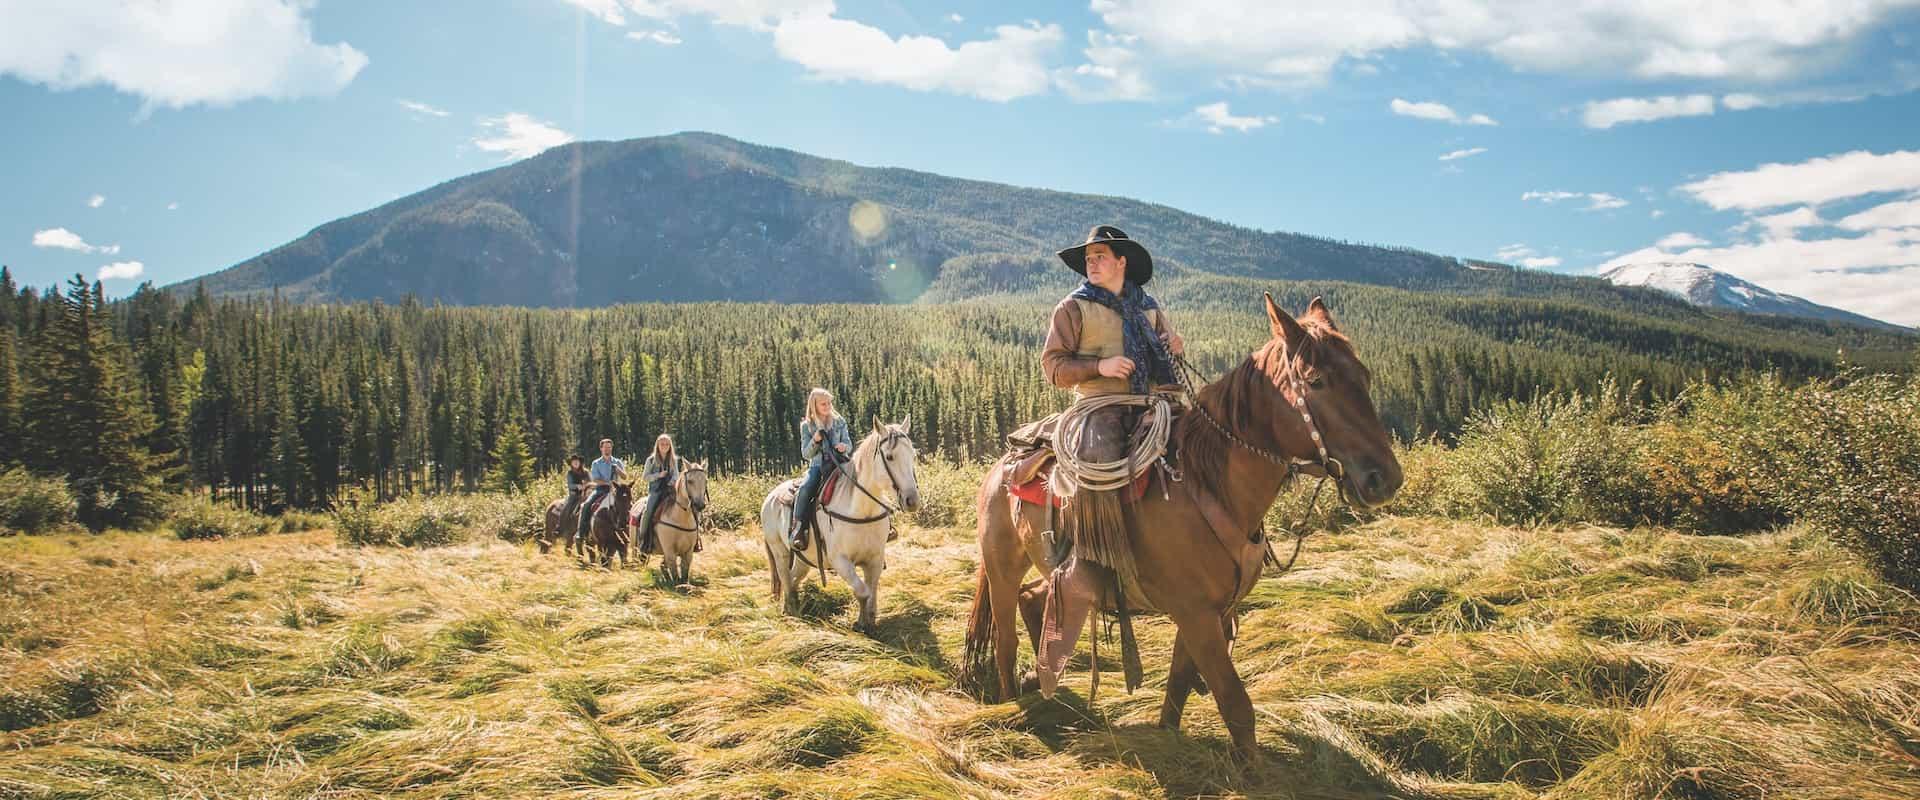 Horseback Ride + Cowboy BBQ Cookout